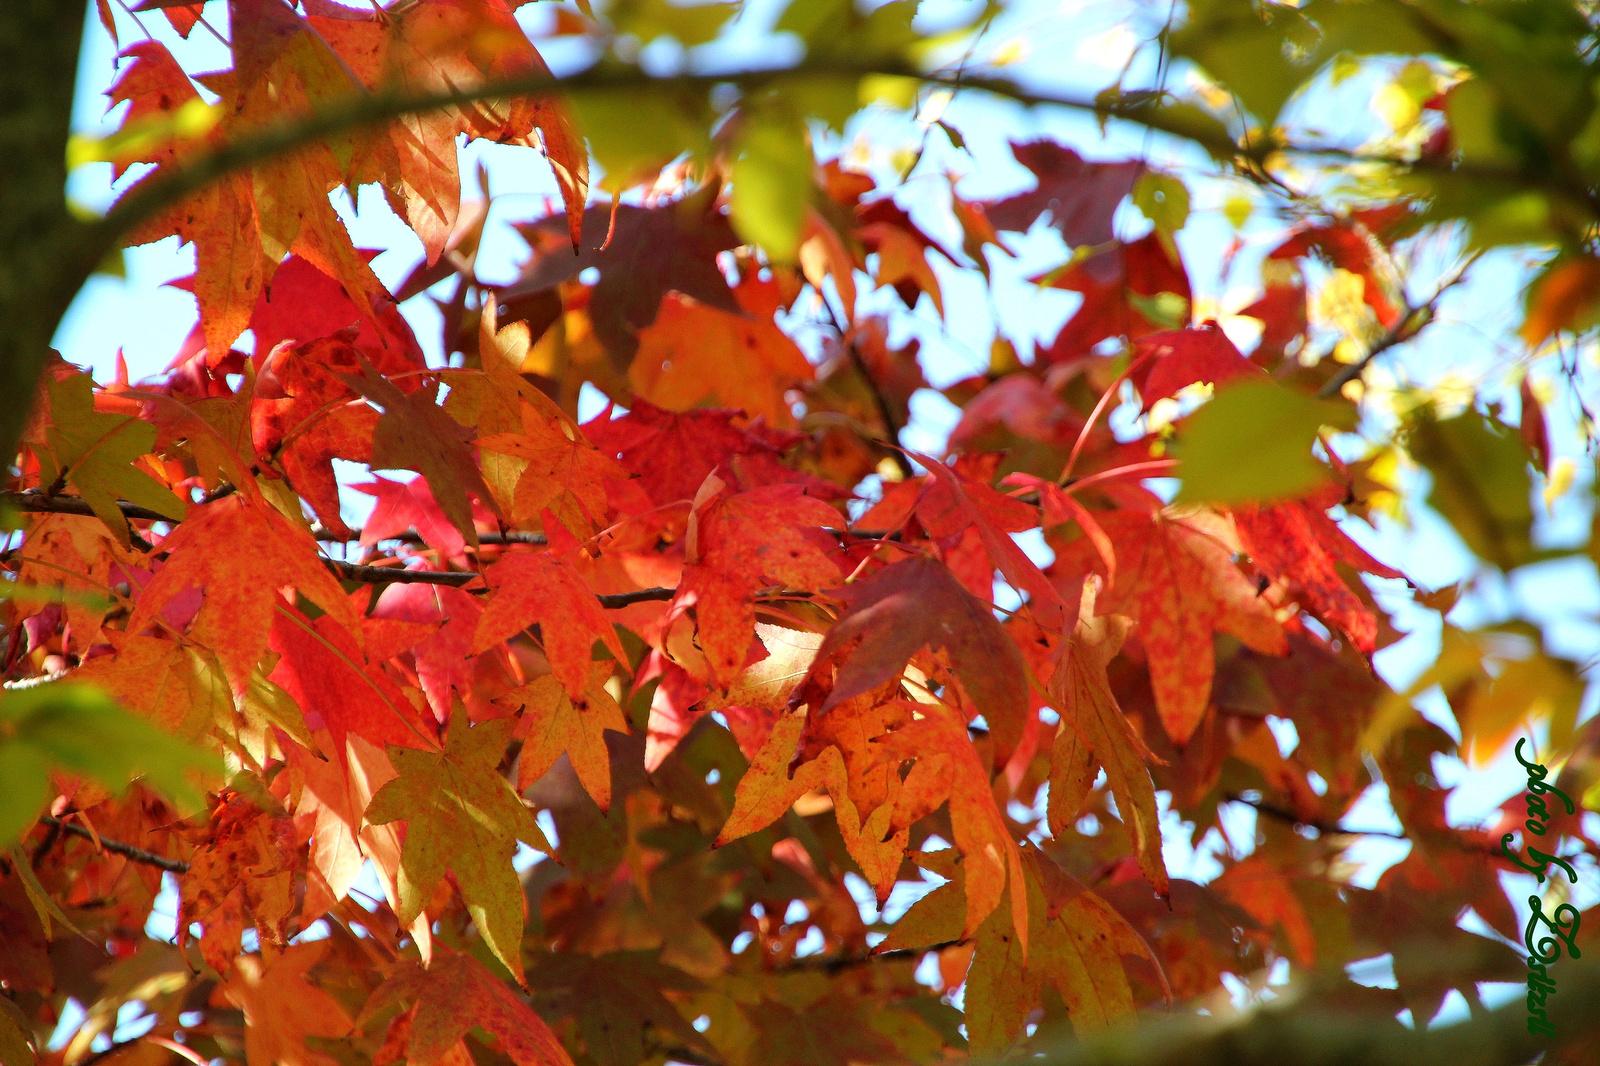 Piros levelű fa